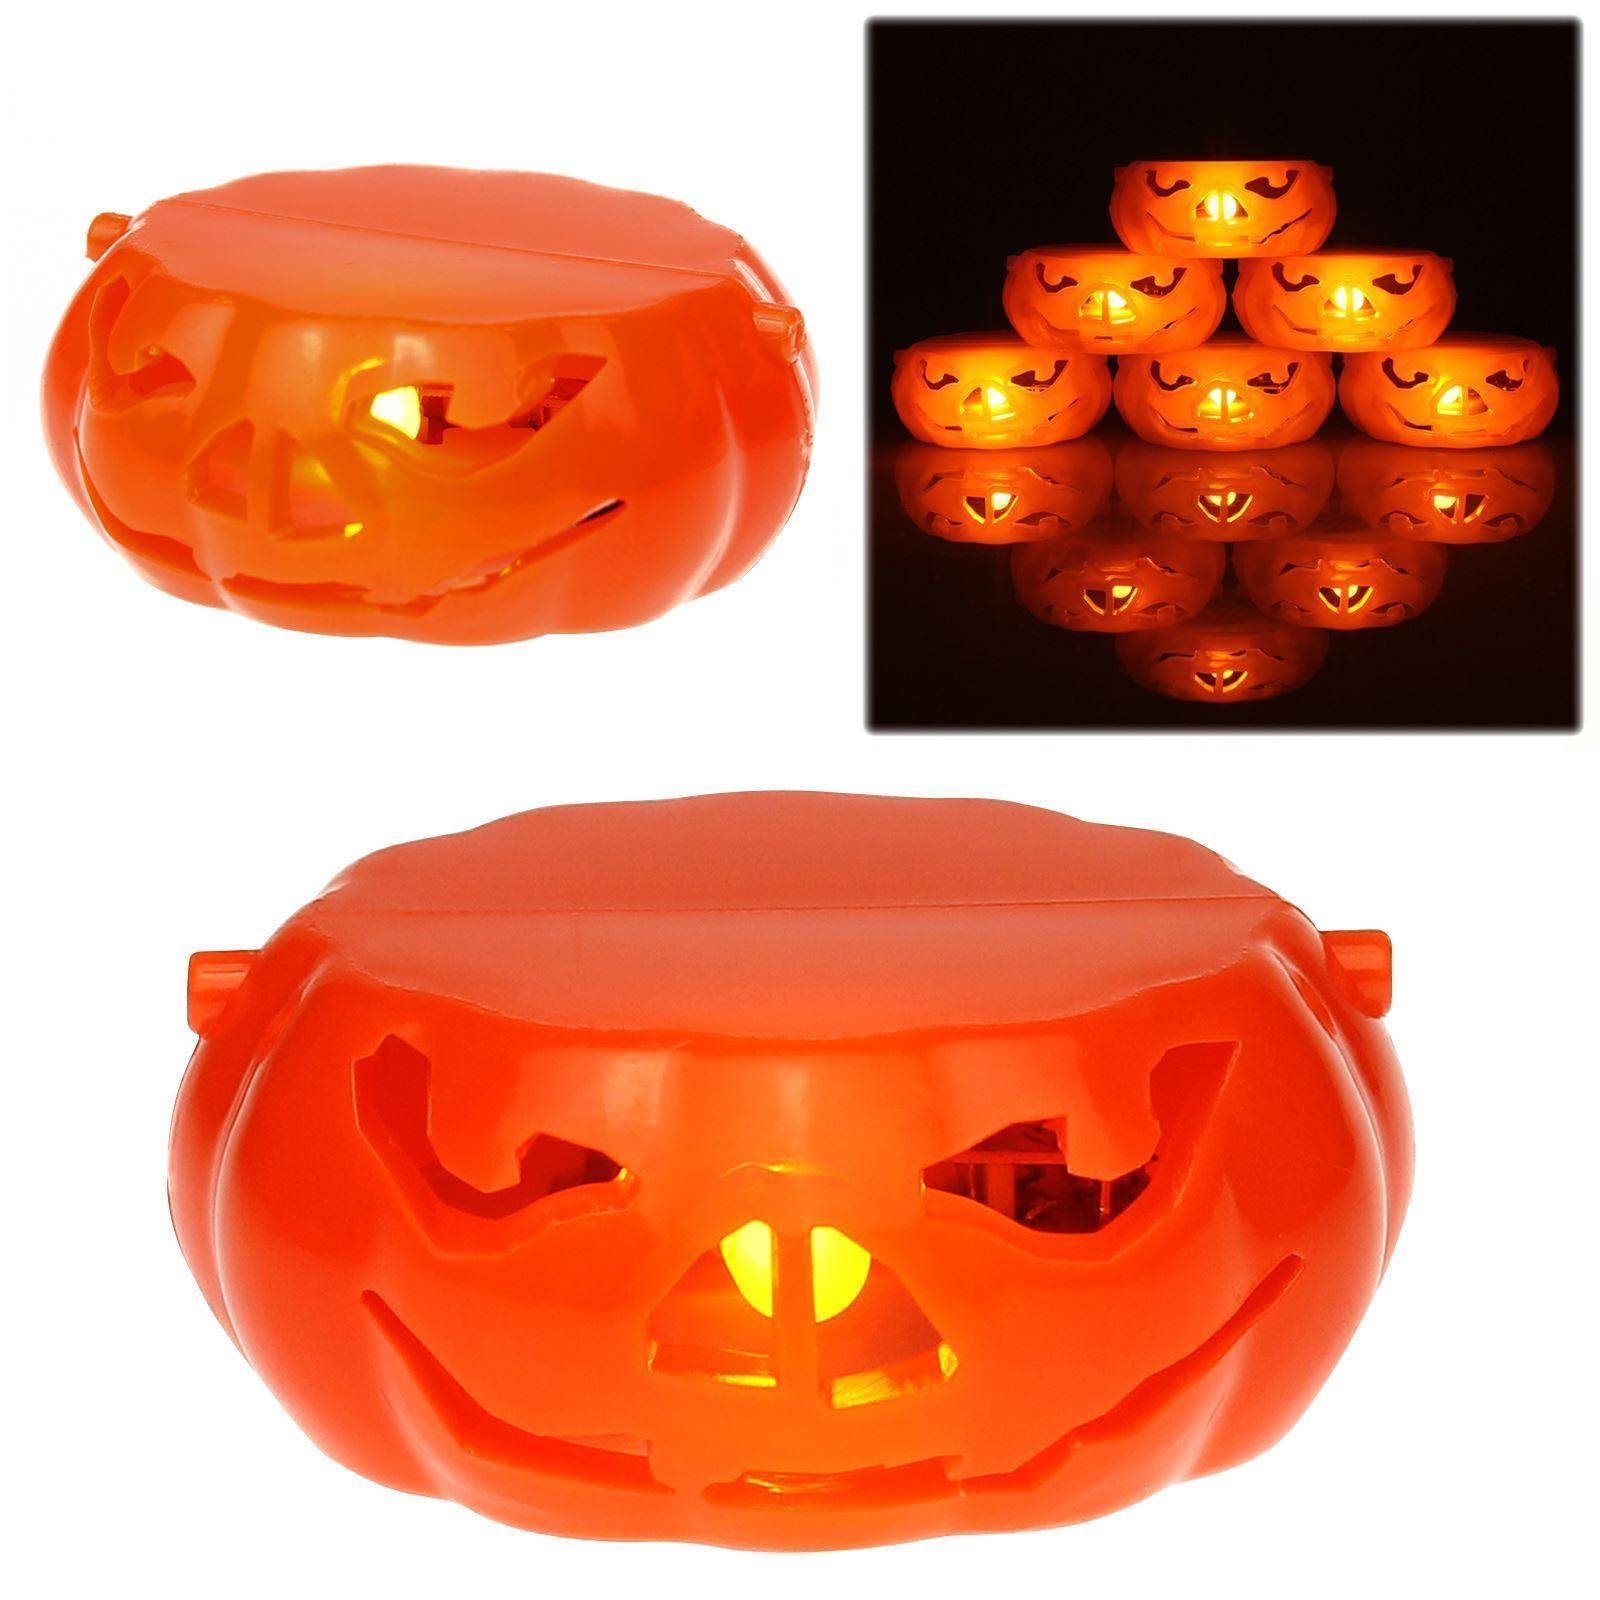 AMOS Flameless LED Pumpkin Tea Light Candle Battery Halloween Party Tealight New